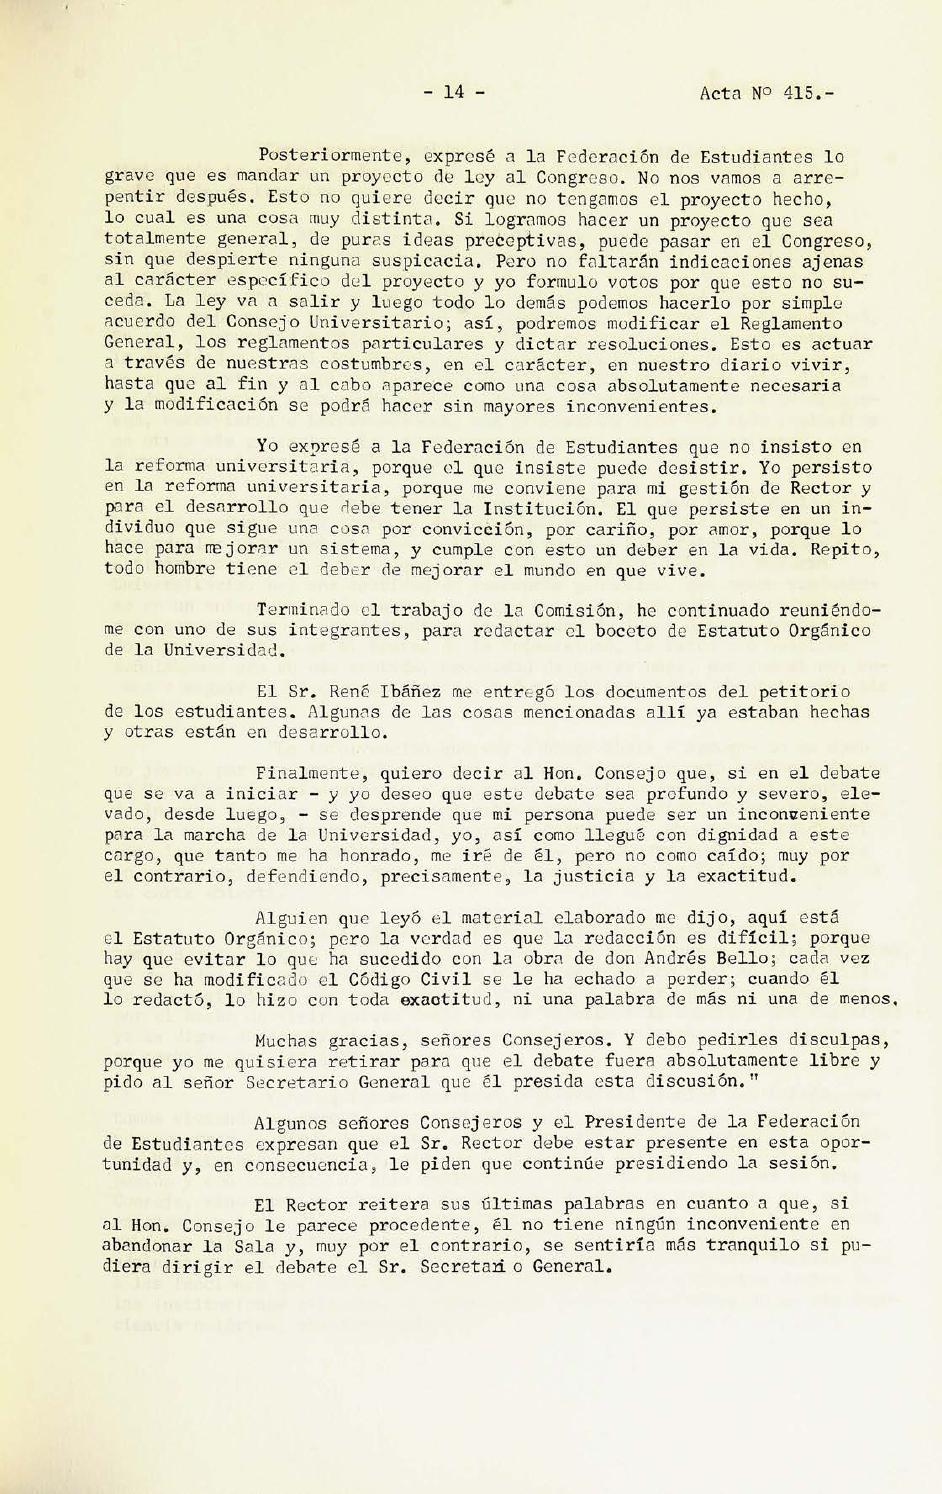 Actas del consejo 405 429 opt - parte 2 by Archivo Patrimonial - issuu